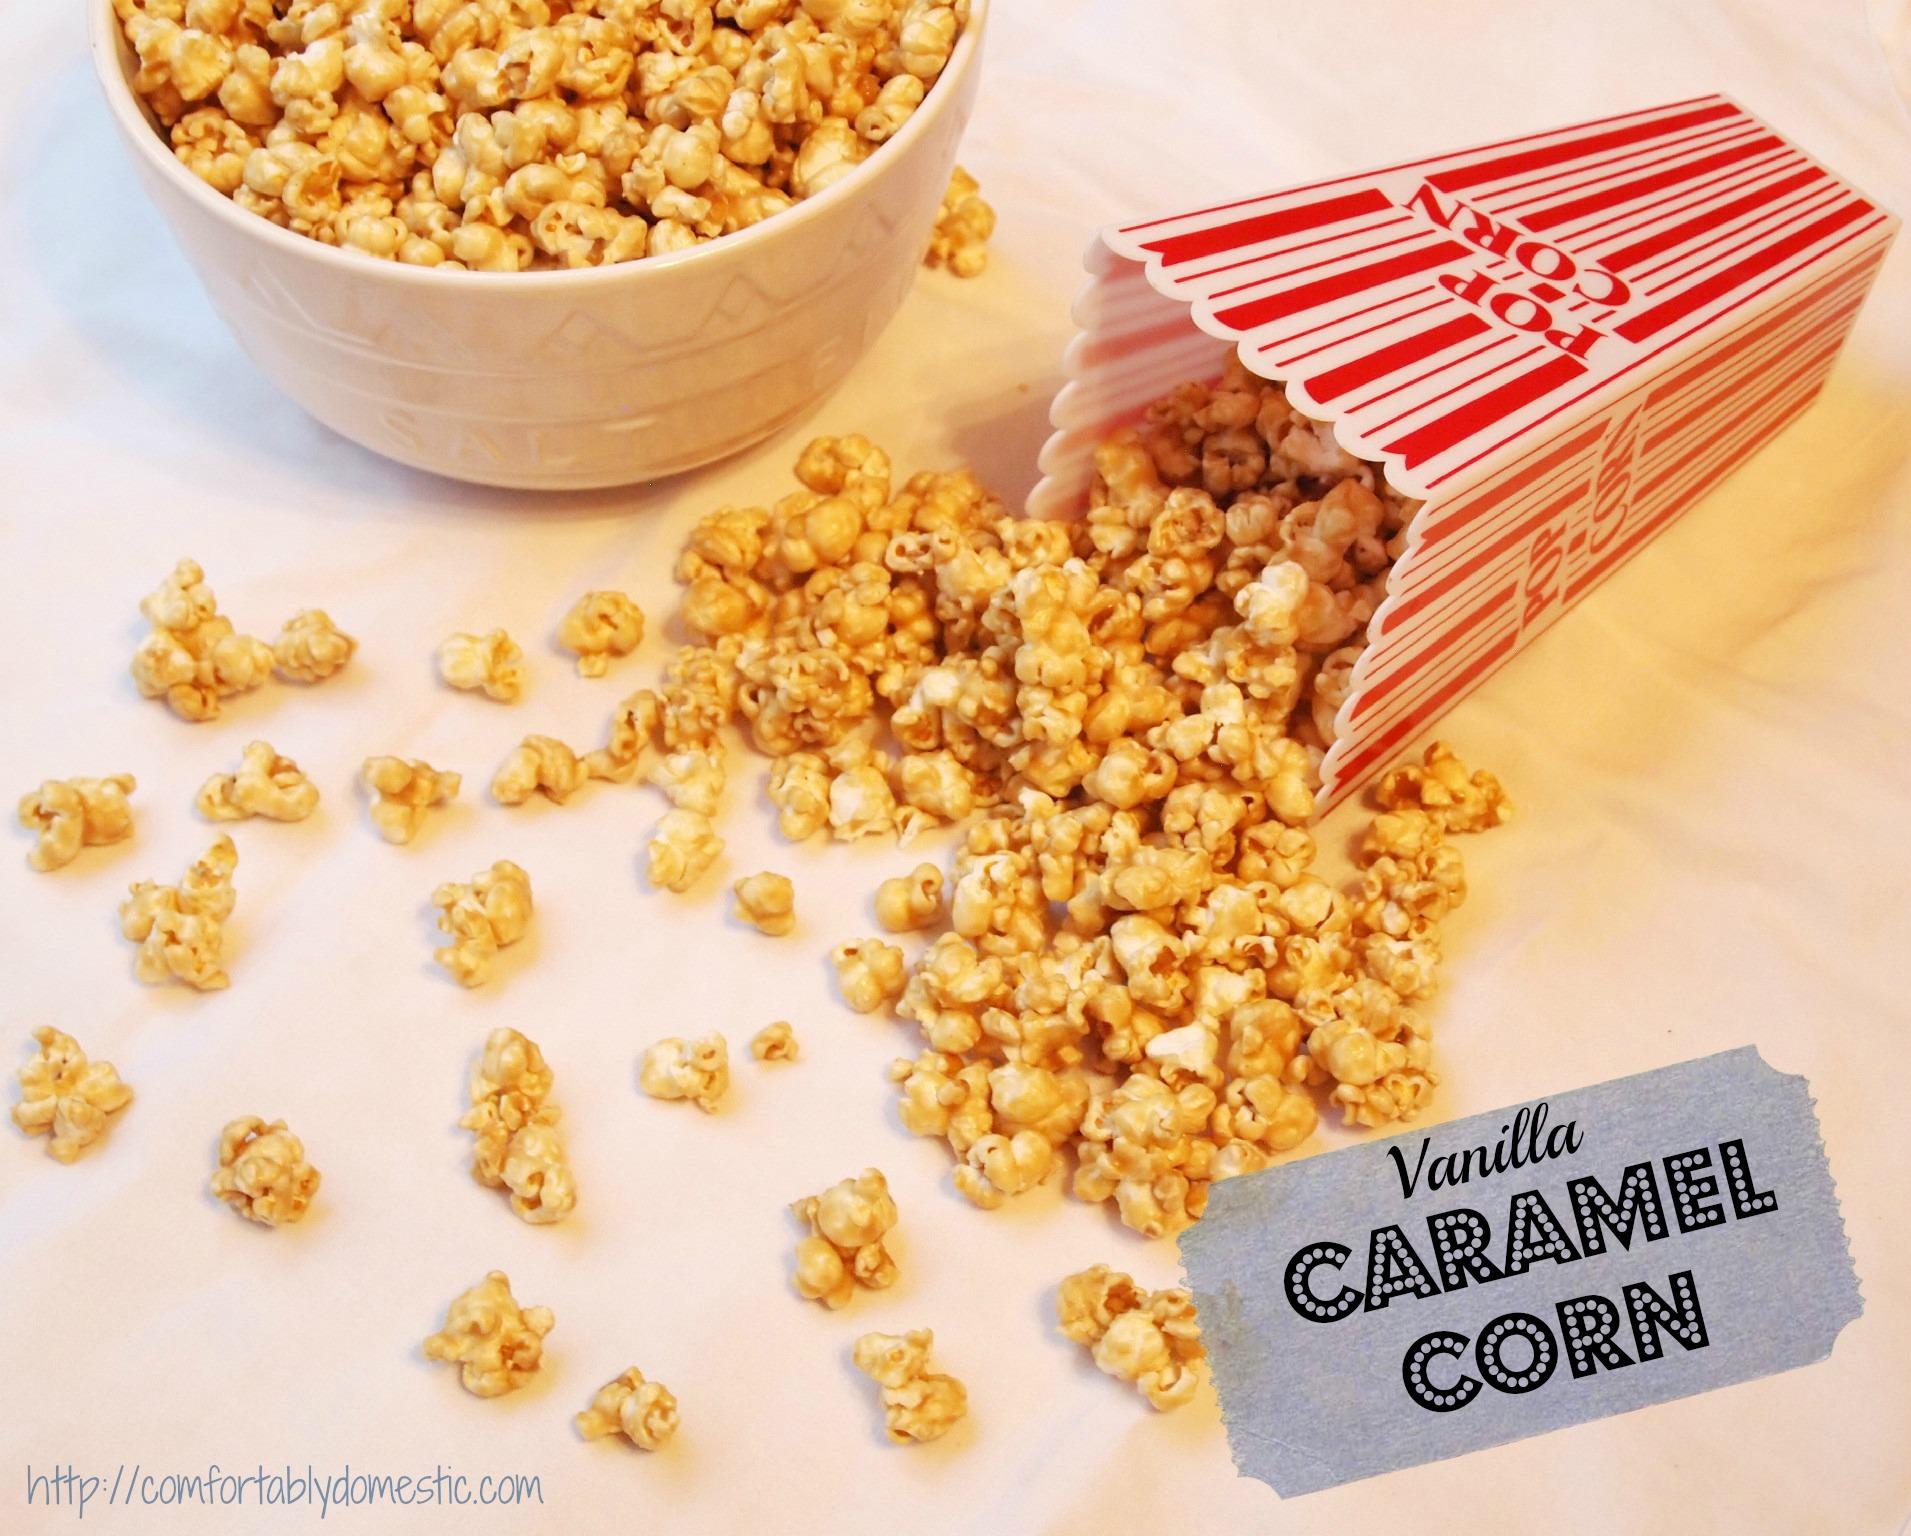 Vanilla Caramel Corn via ComfortablyDomestic